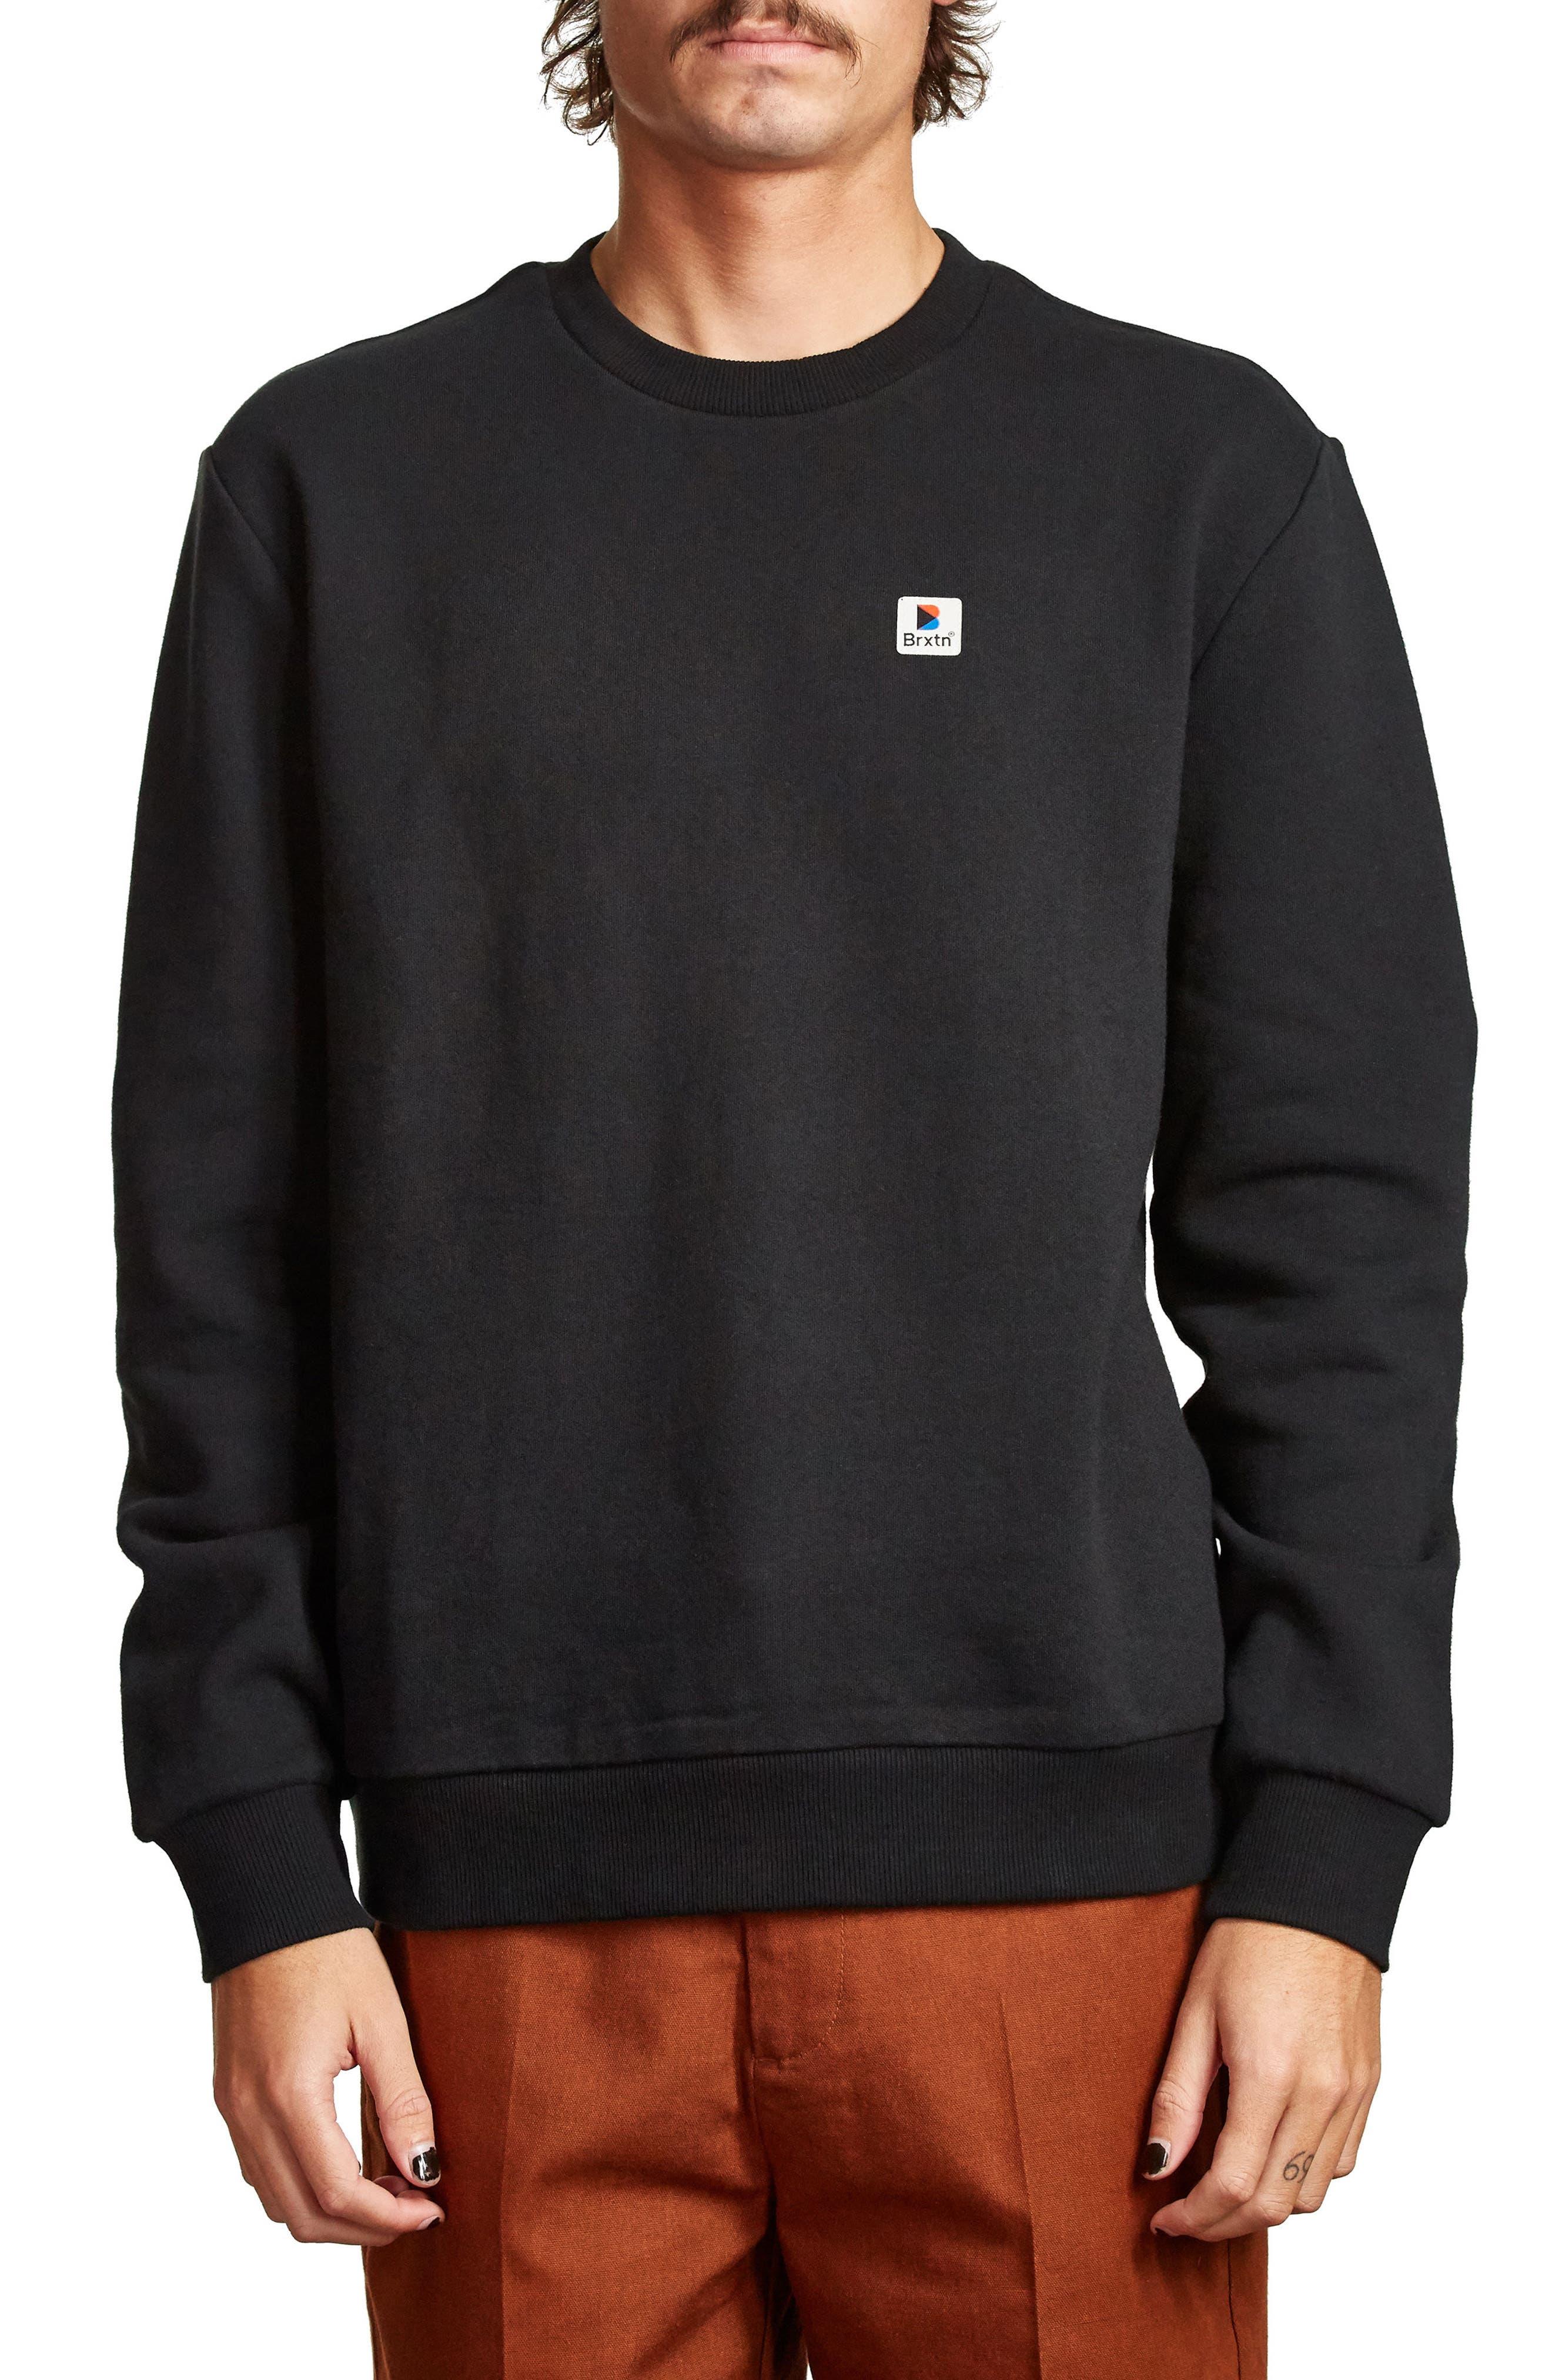 Stonewell Sweatshirt,                             Main thumbnail 1, color,                             001